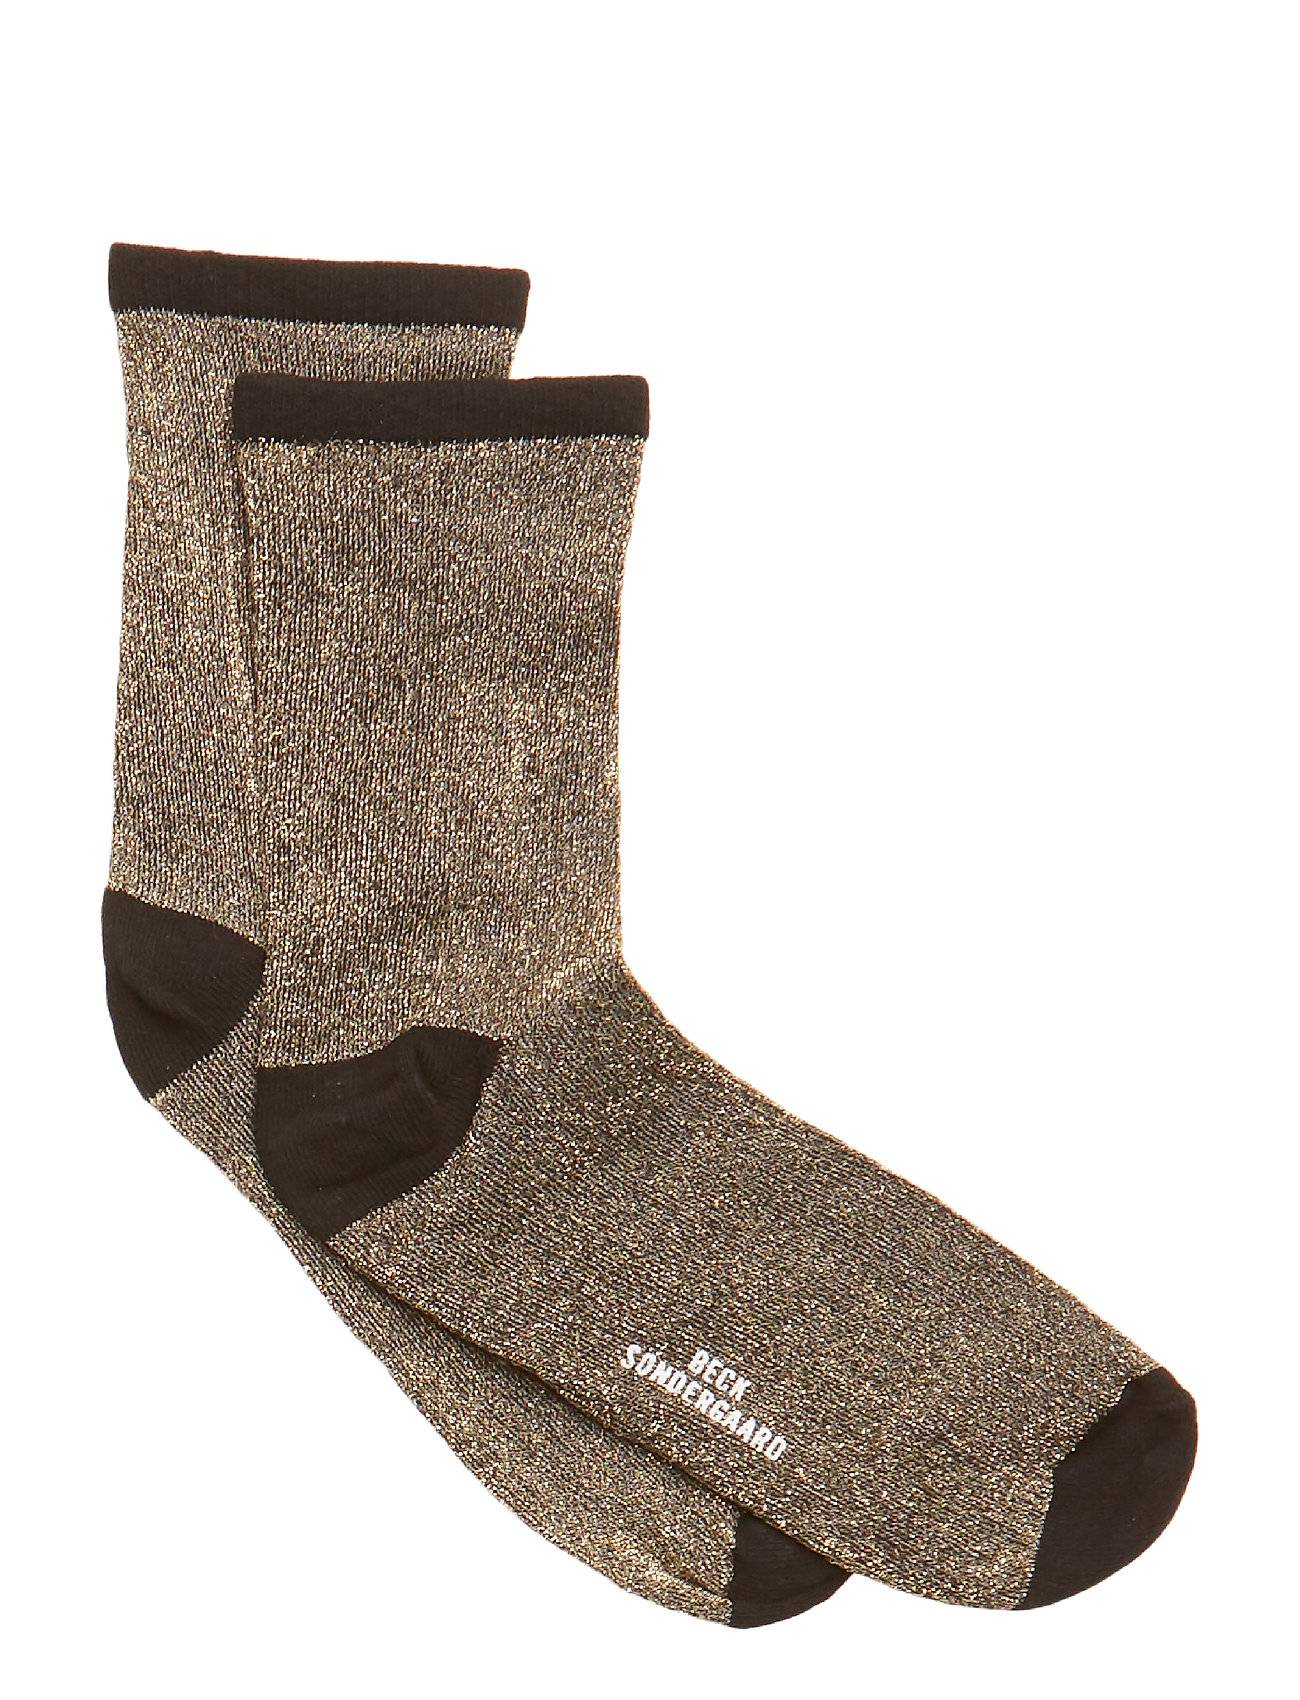 Becksöndergaard Dina Solid Lingerie Hosiery Socks Ruskea Becksöndergaard